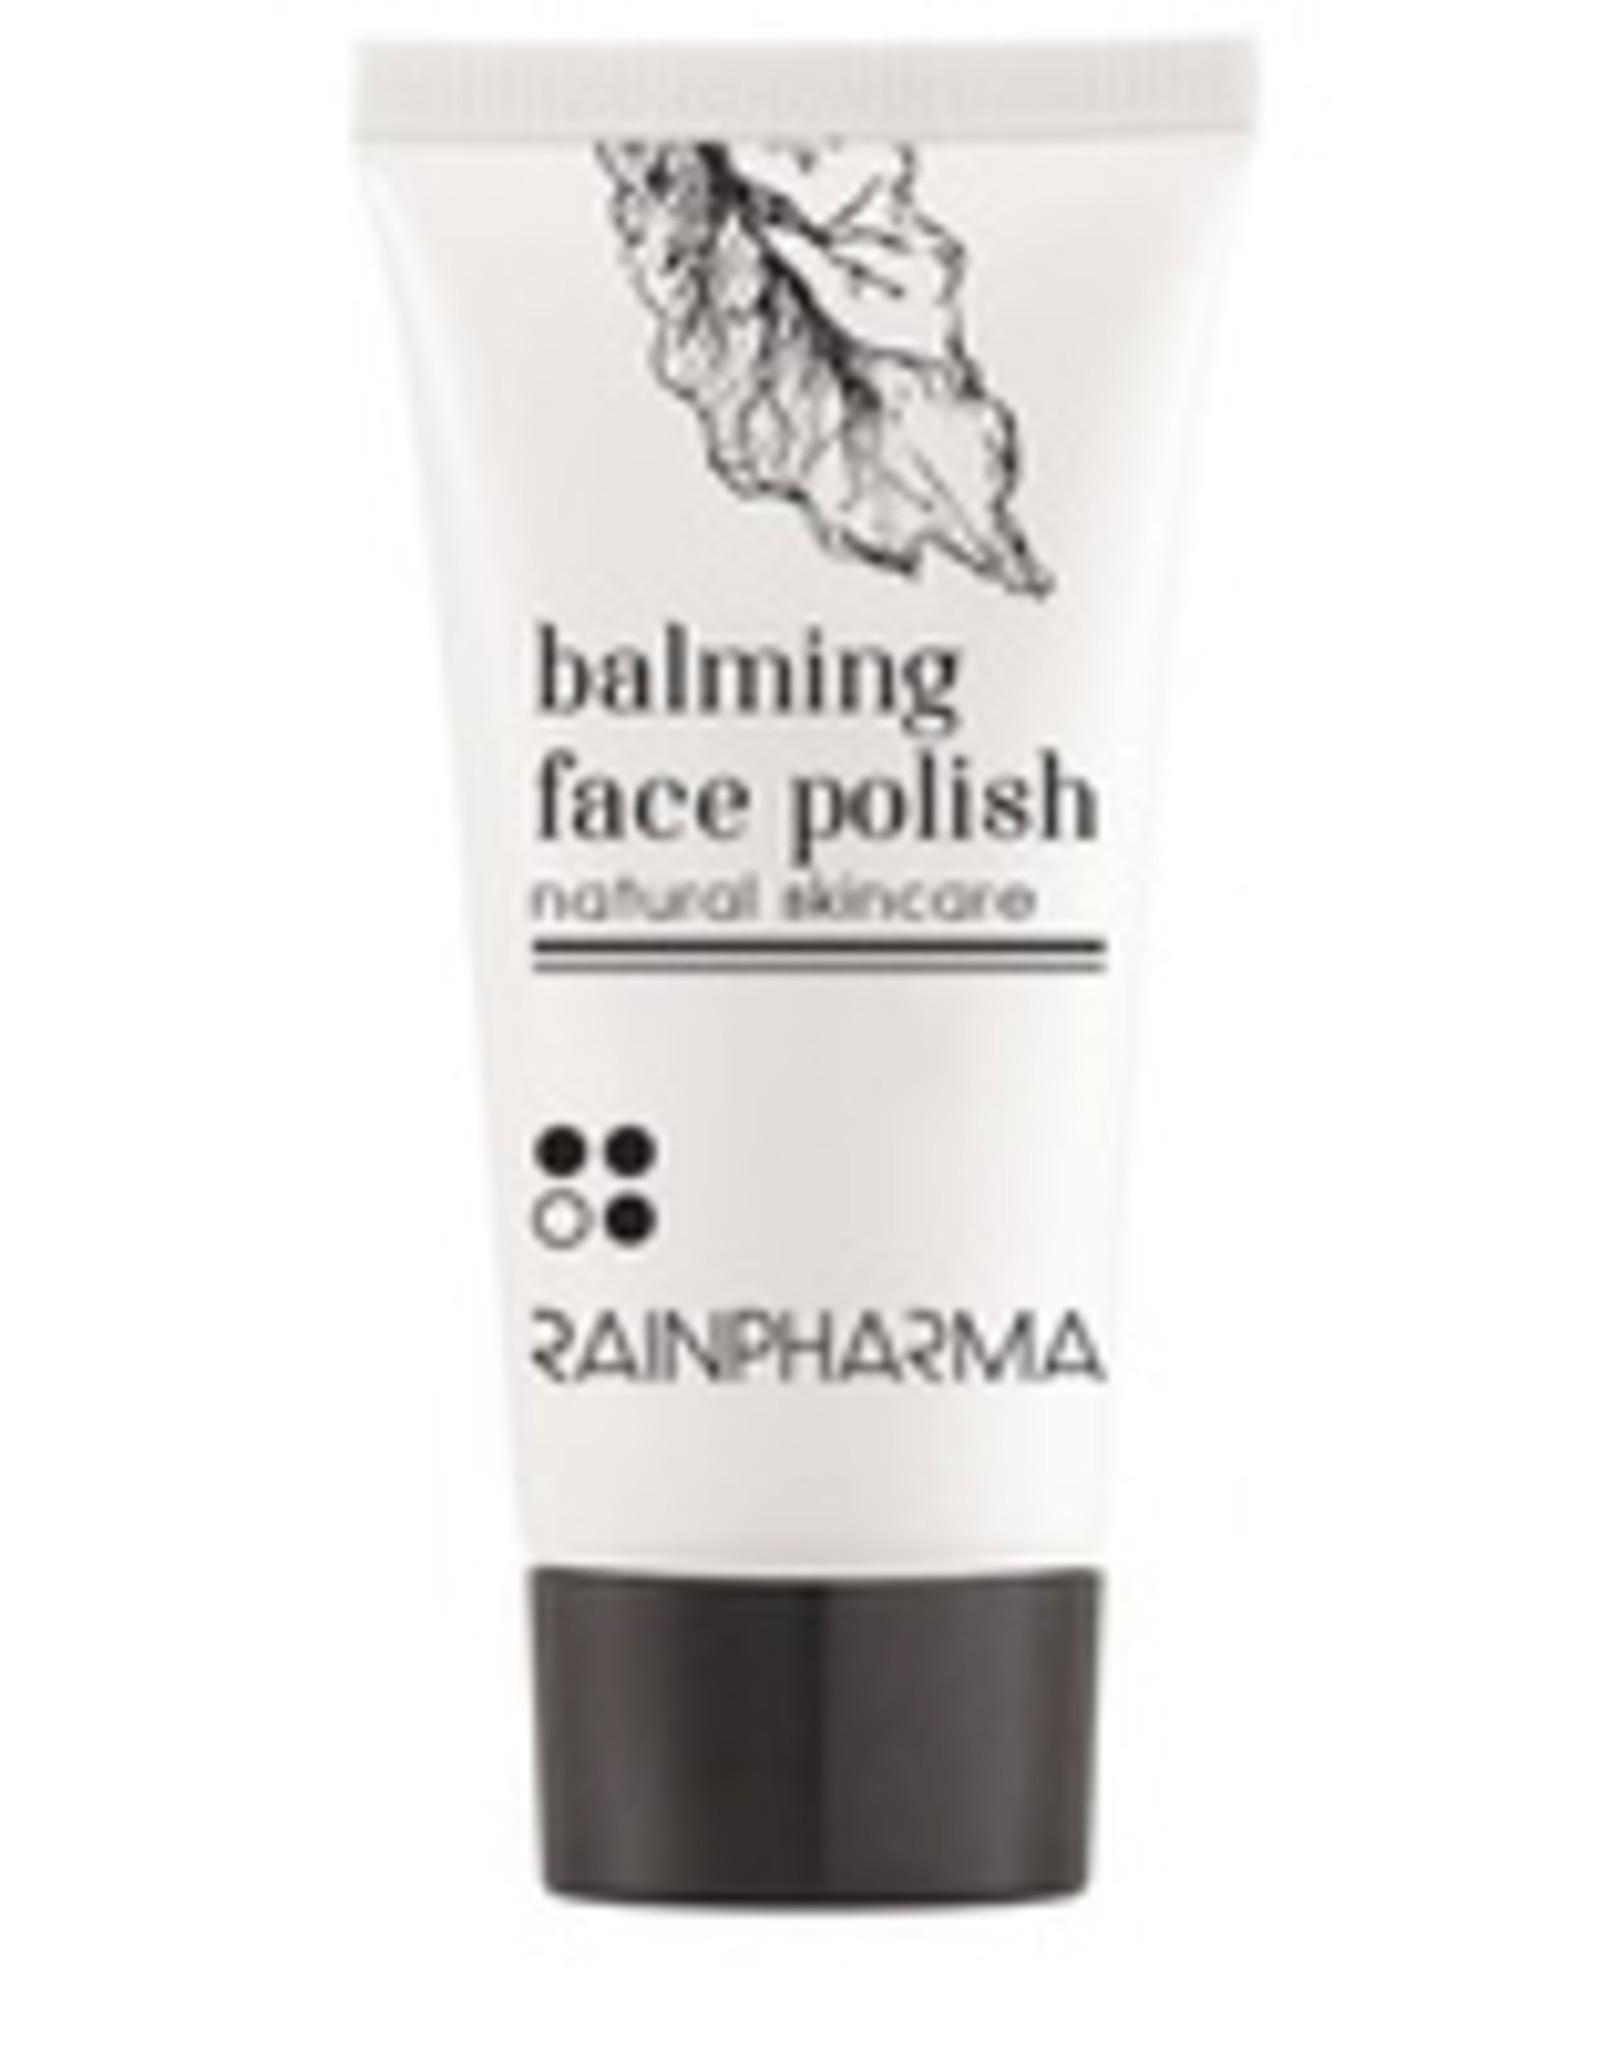 RainPharma Balming Face Polish 20ml TRAVELSIZE - Rainpharma